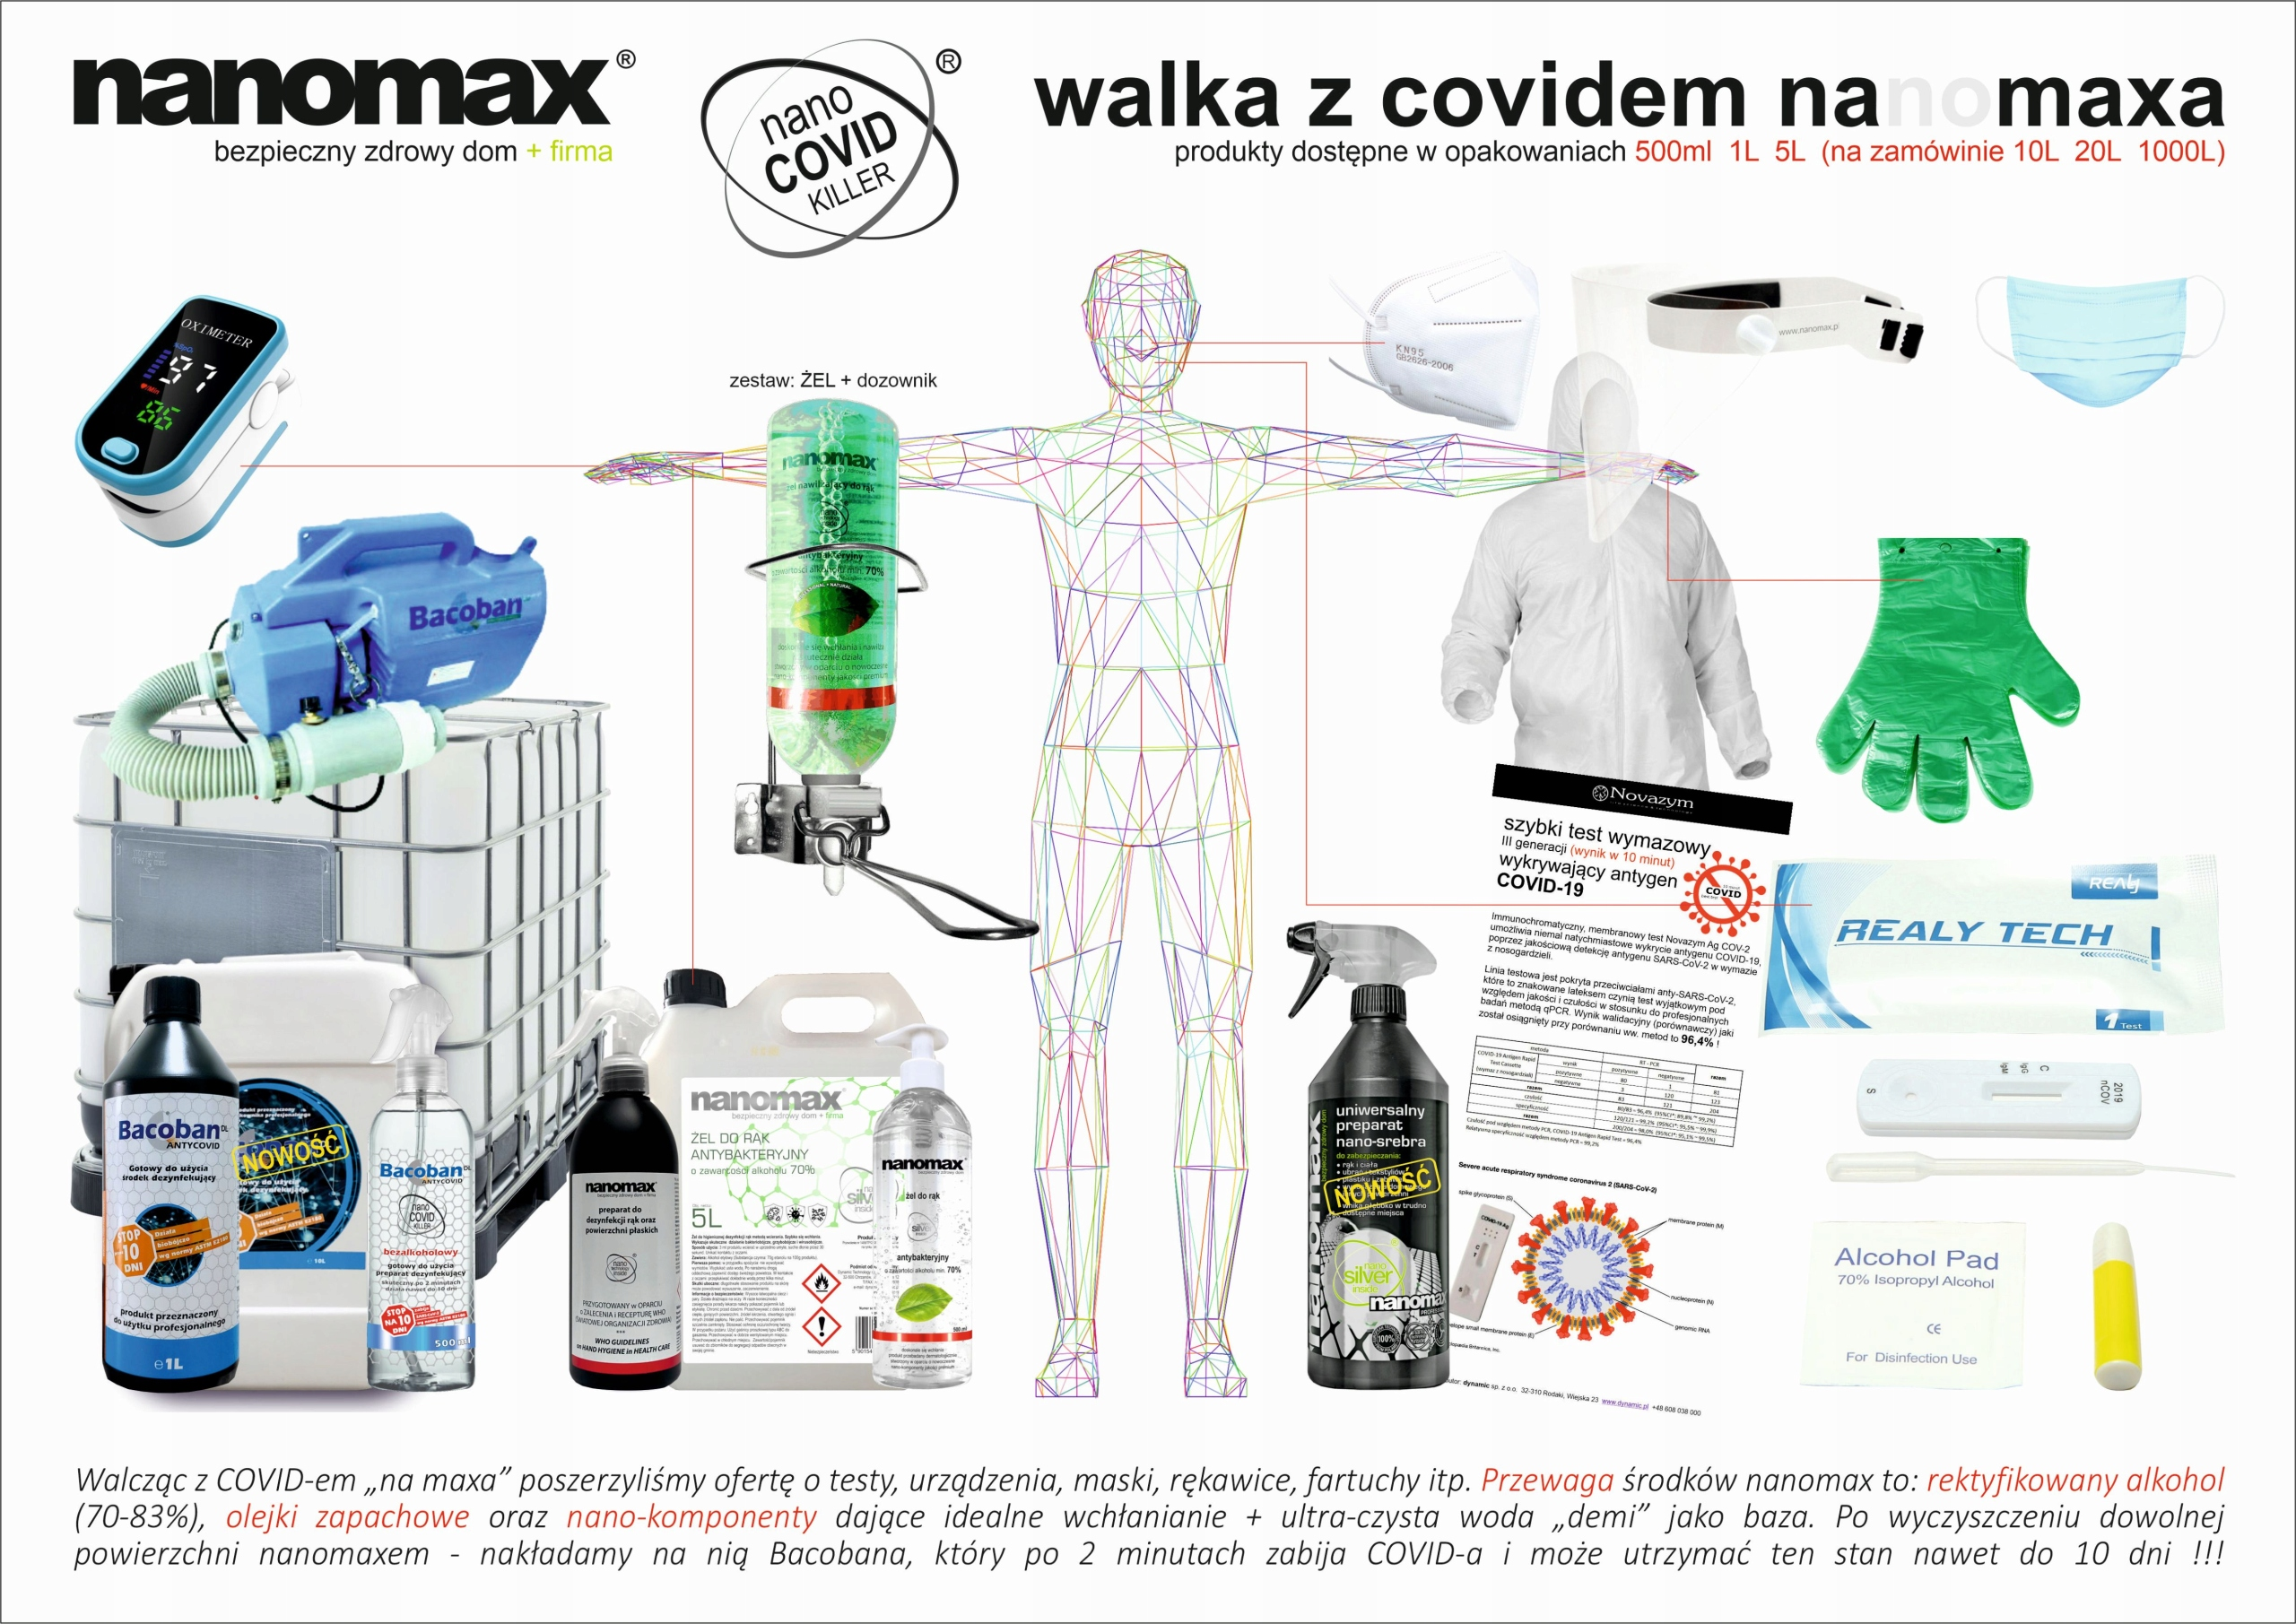 nanomax - żel antybakteryjny do rąk 70% Marka inna